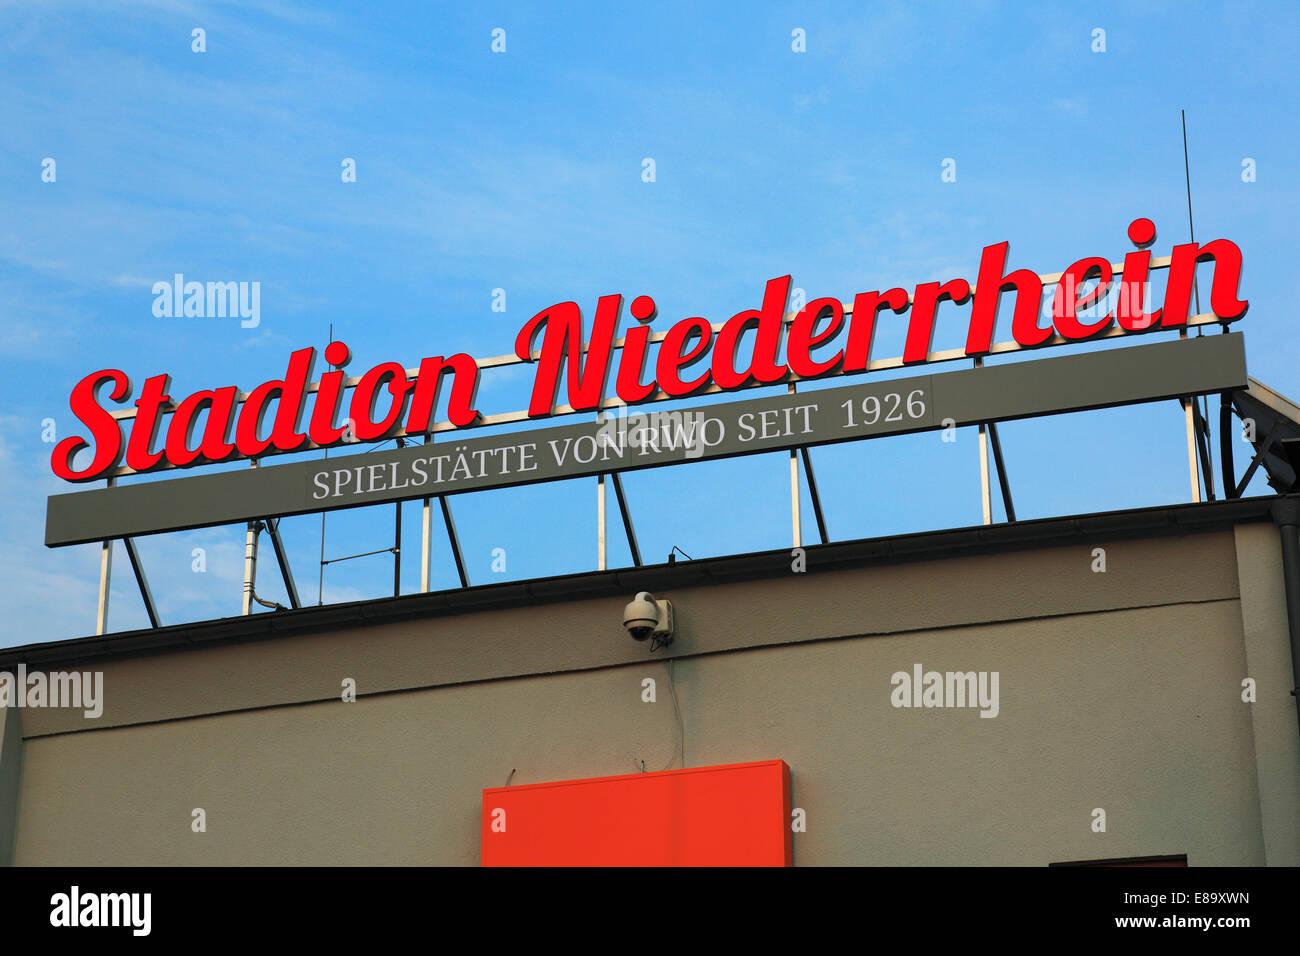 sports, football, Regional League West, 2014/2015, Rot Weiss Oberhausen versus VfL Sportfreunde Lotte 0:1, lettering - Stock Image